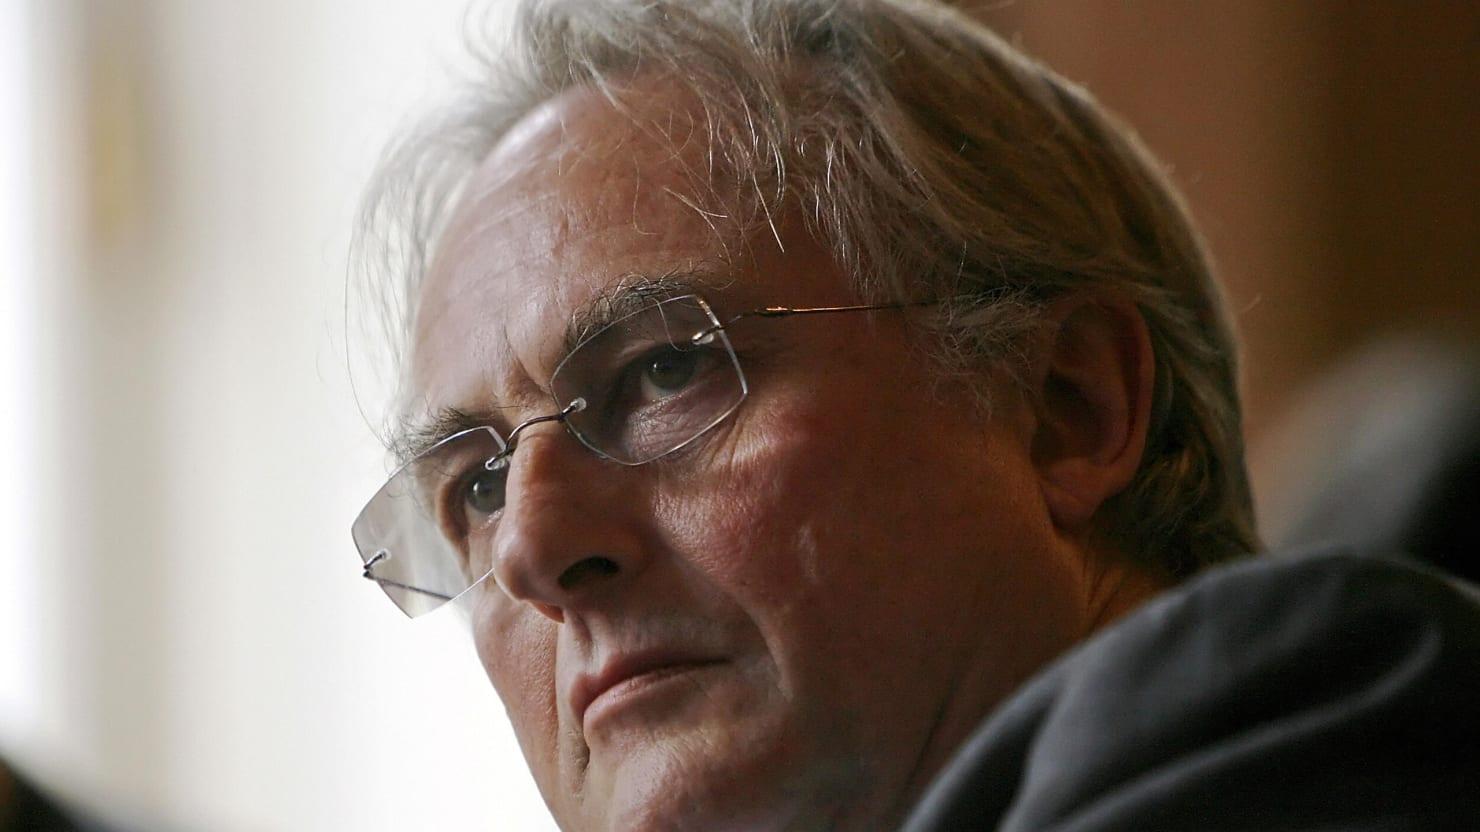 richard dawkins would fail philosophy 101